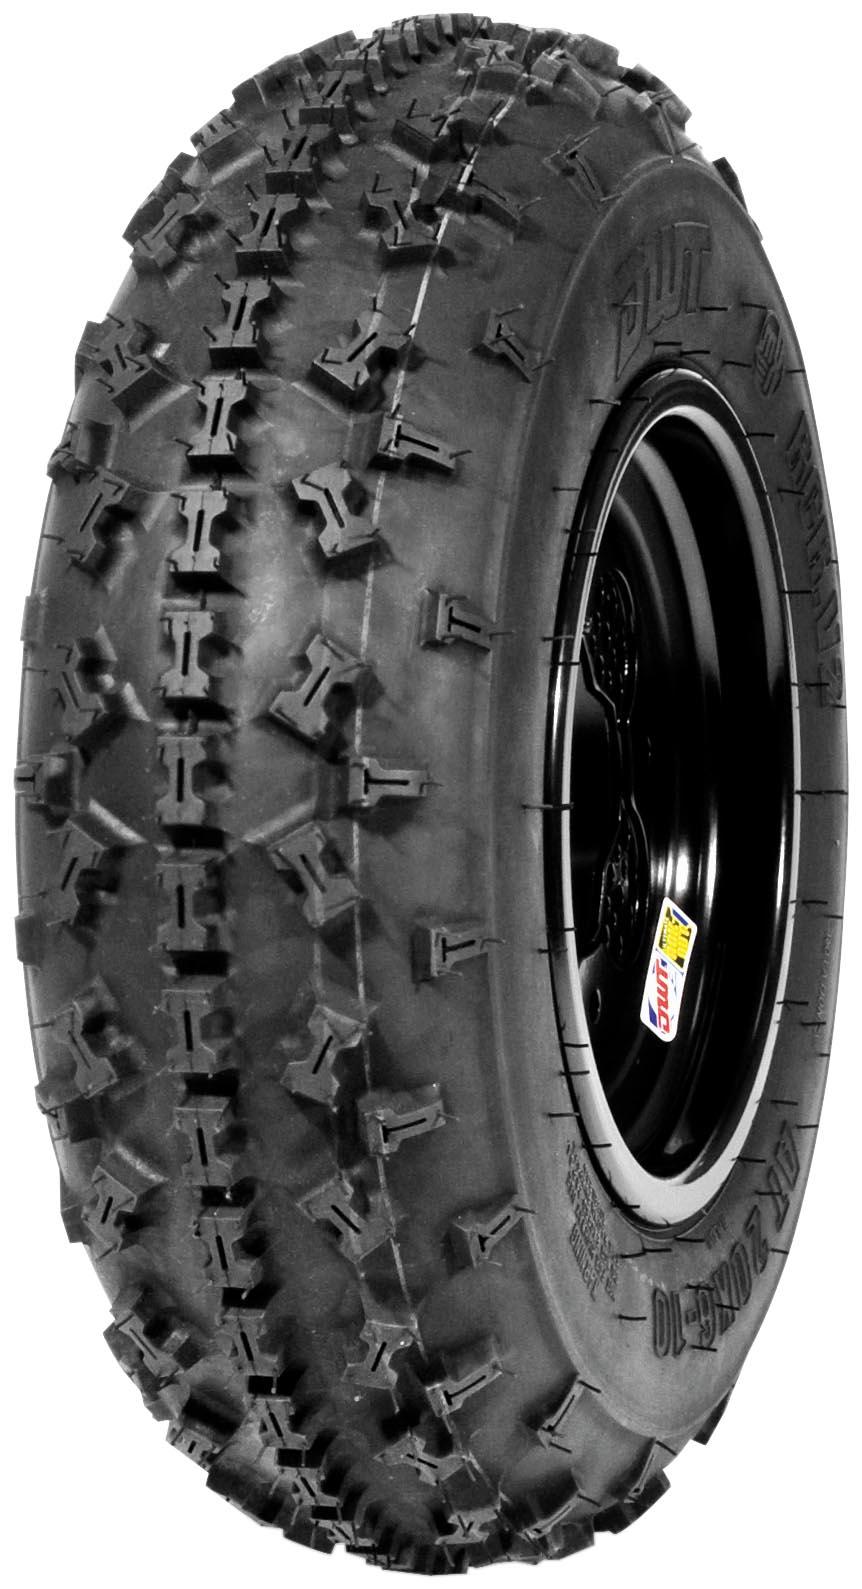 MX V2 Tire